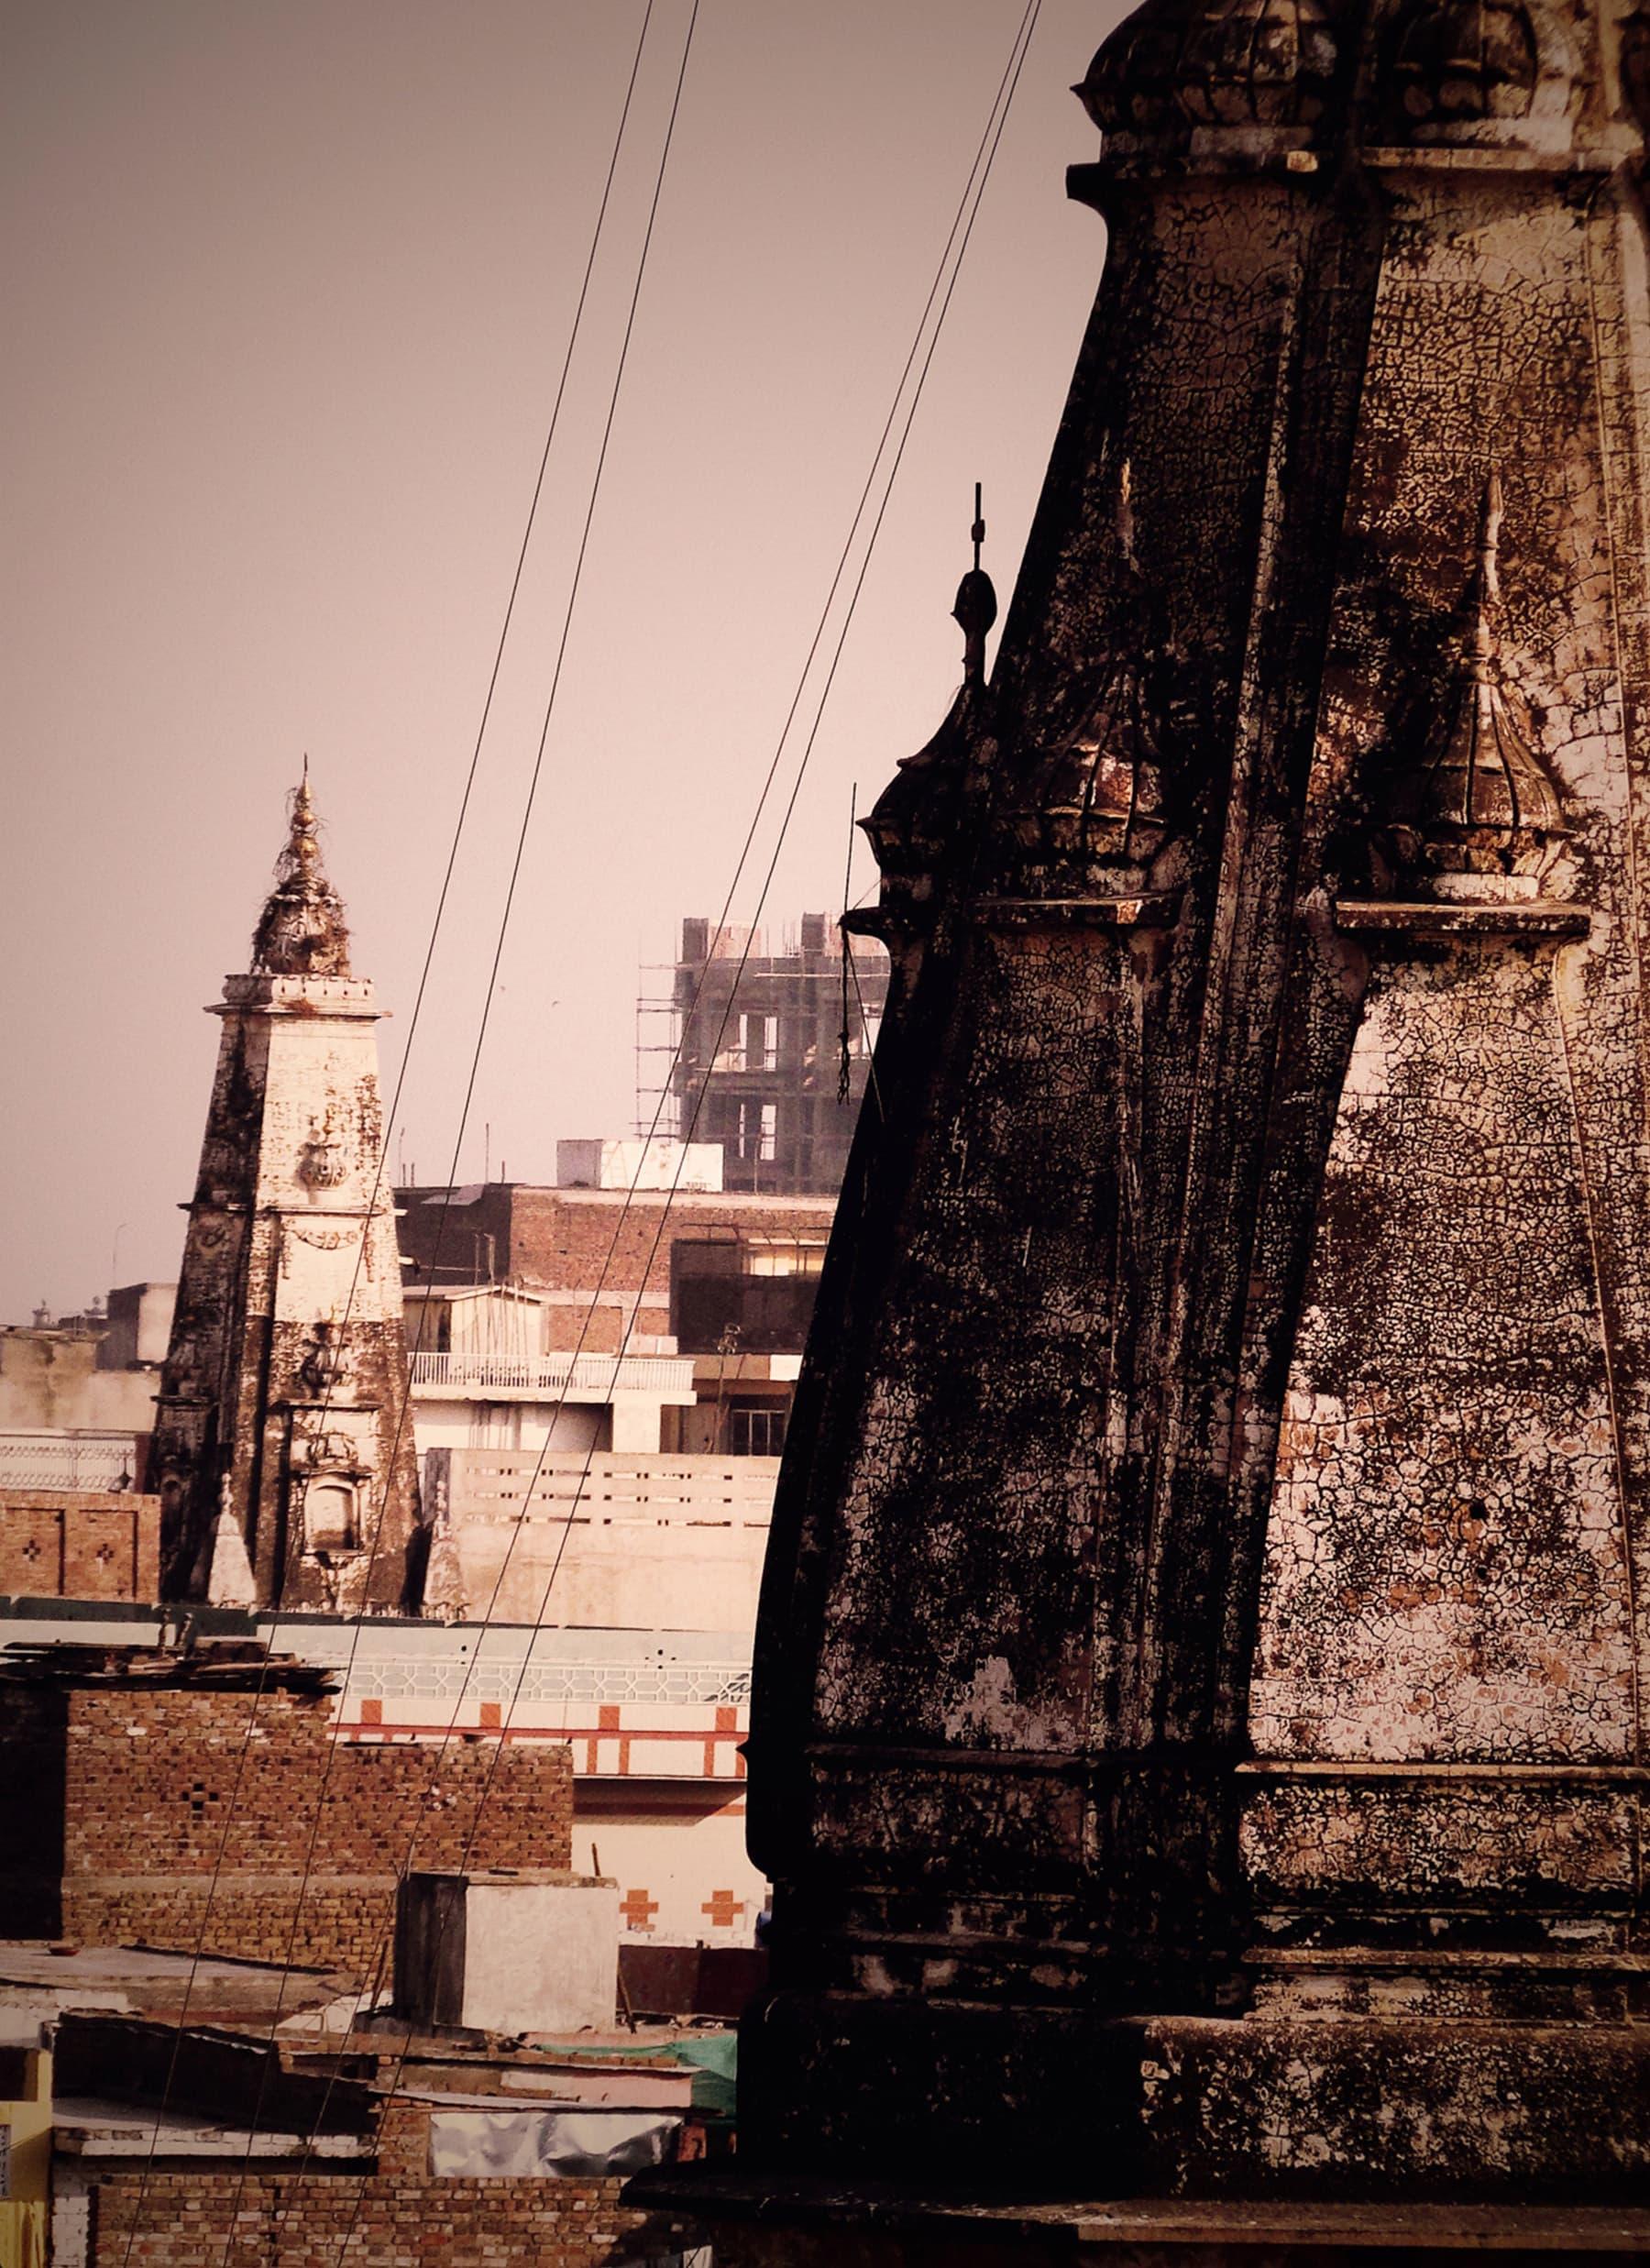 Mohan Mandir in the background with another mandir in front at Landa bazaar. —Sultan Ali